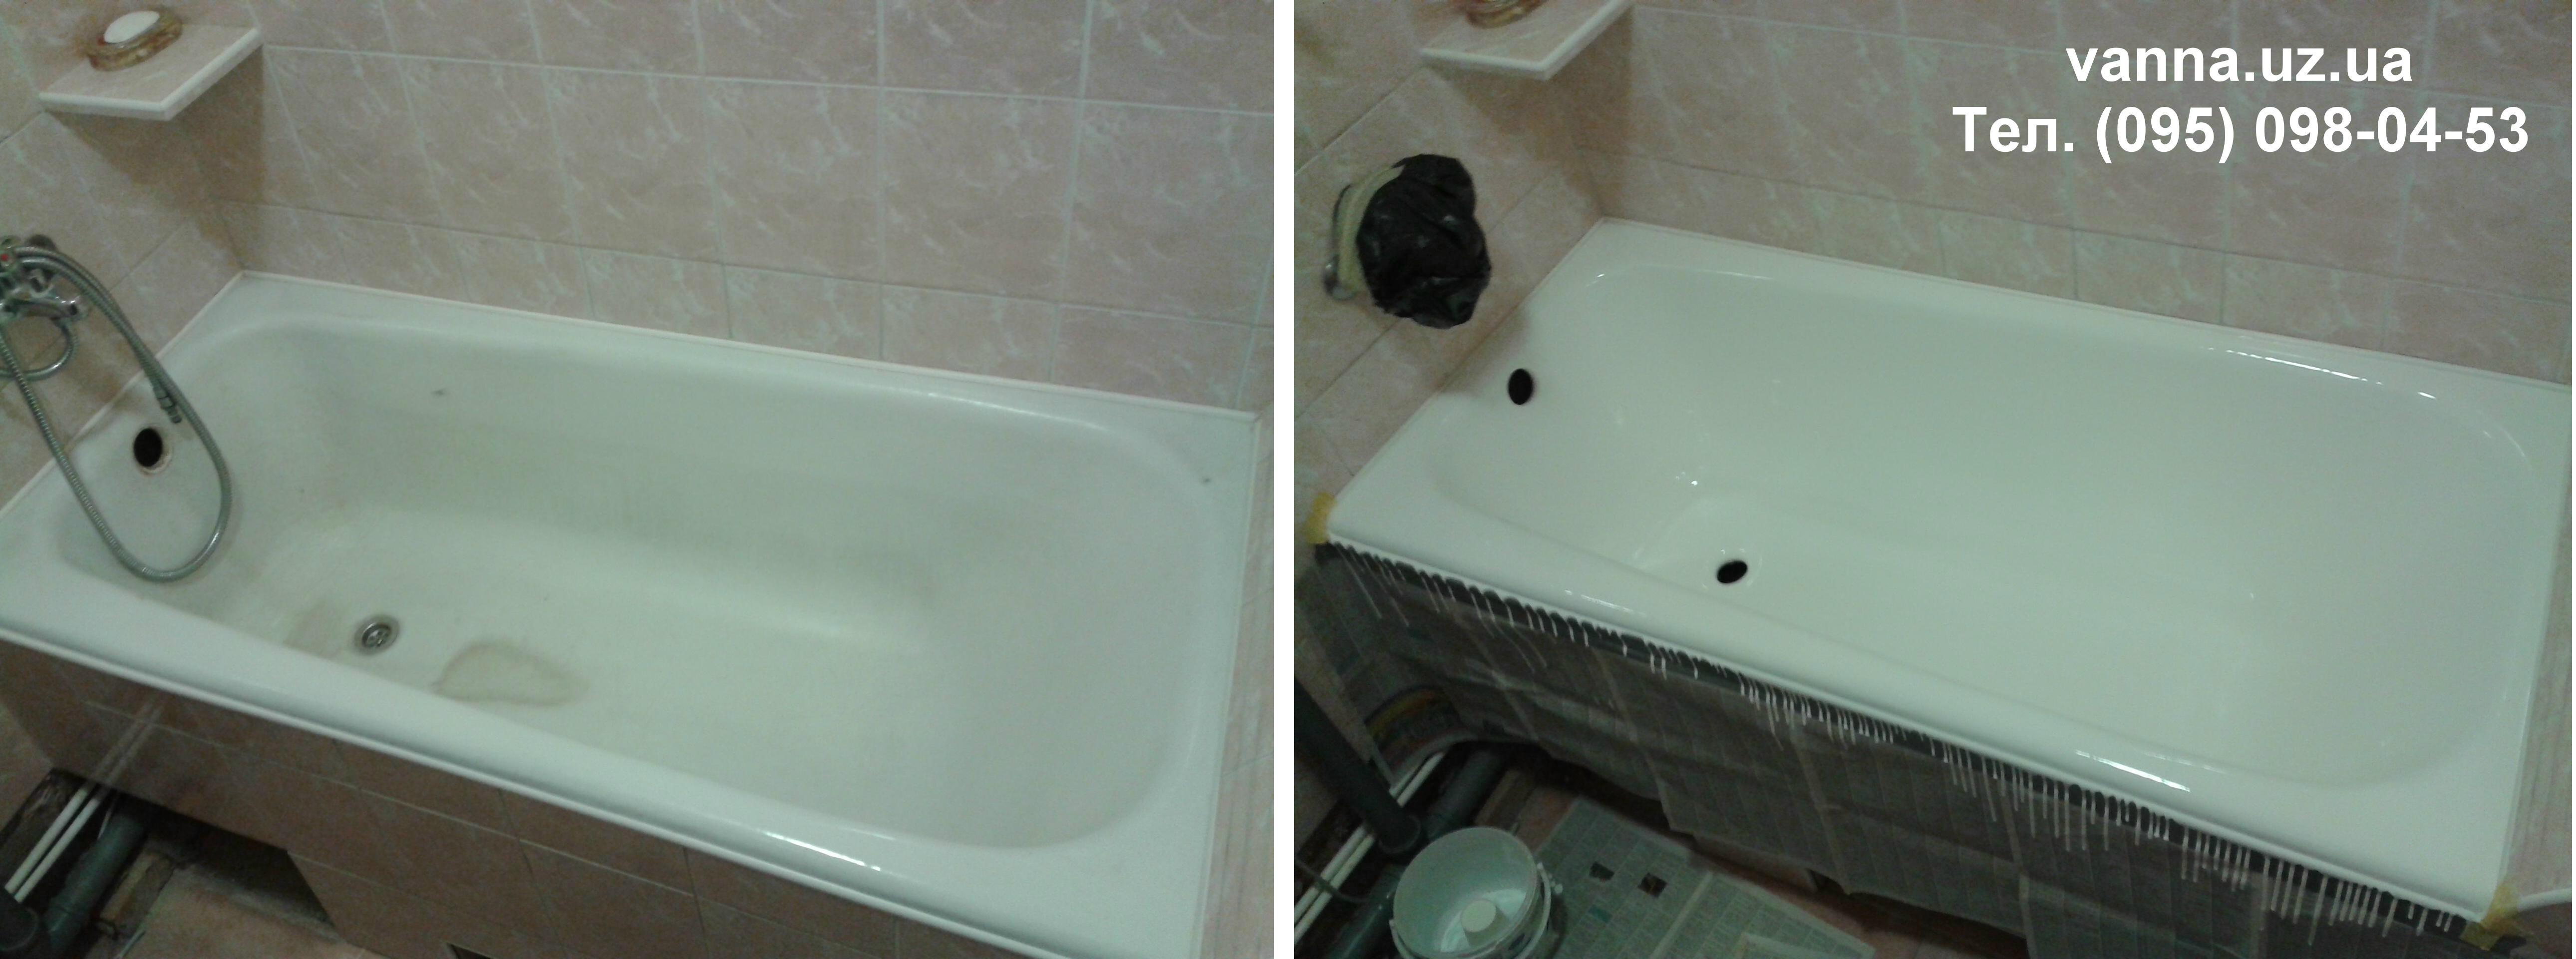 залізна ванна